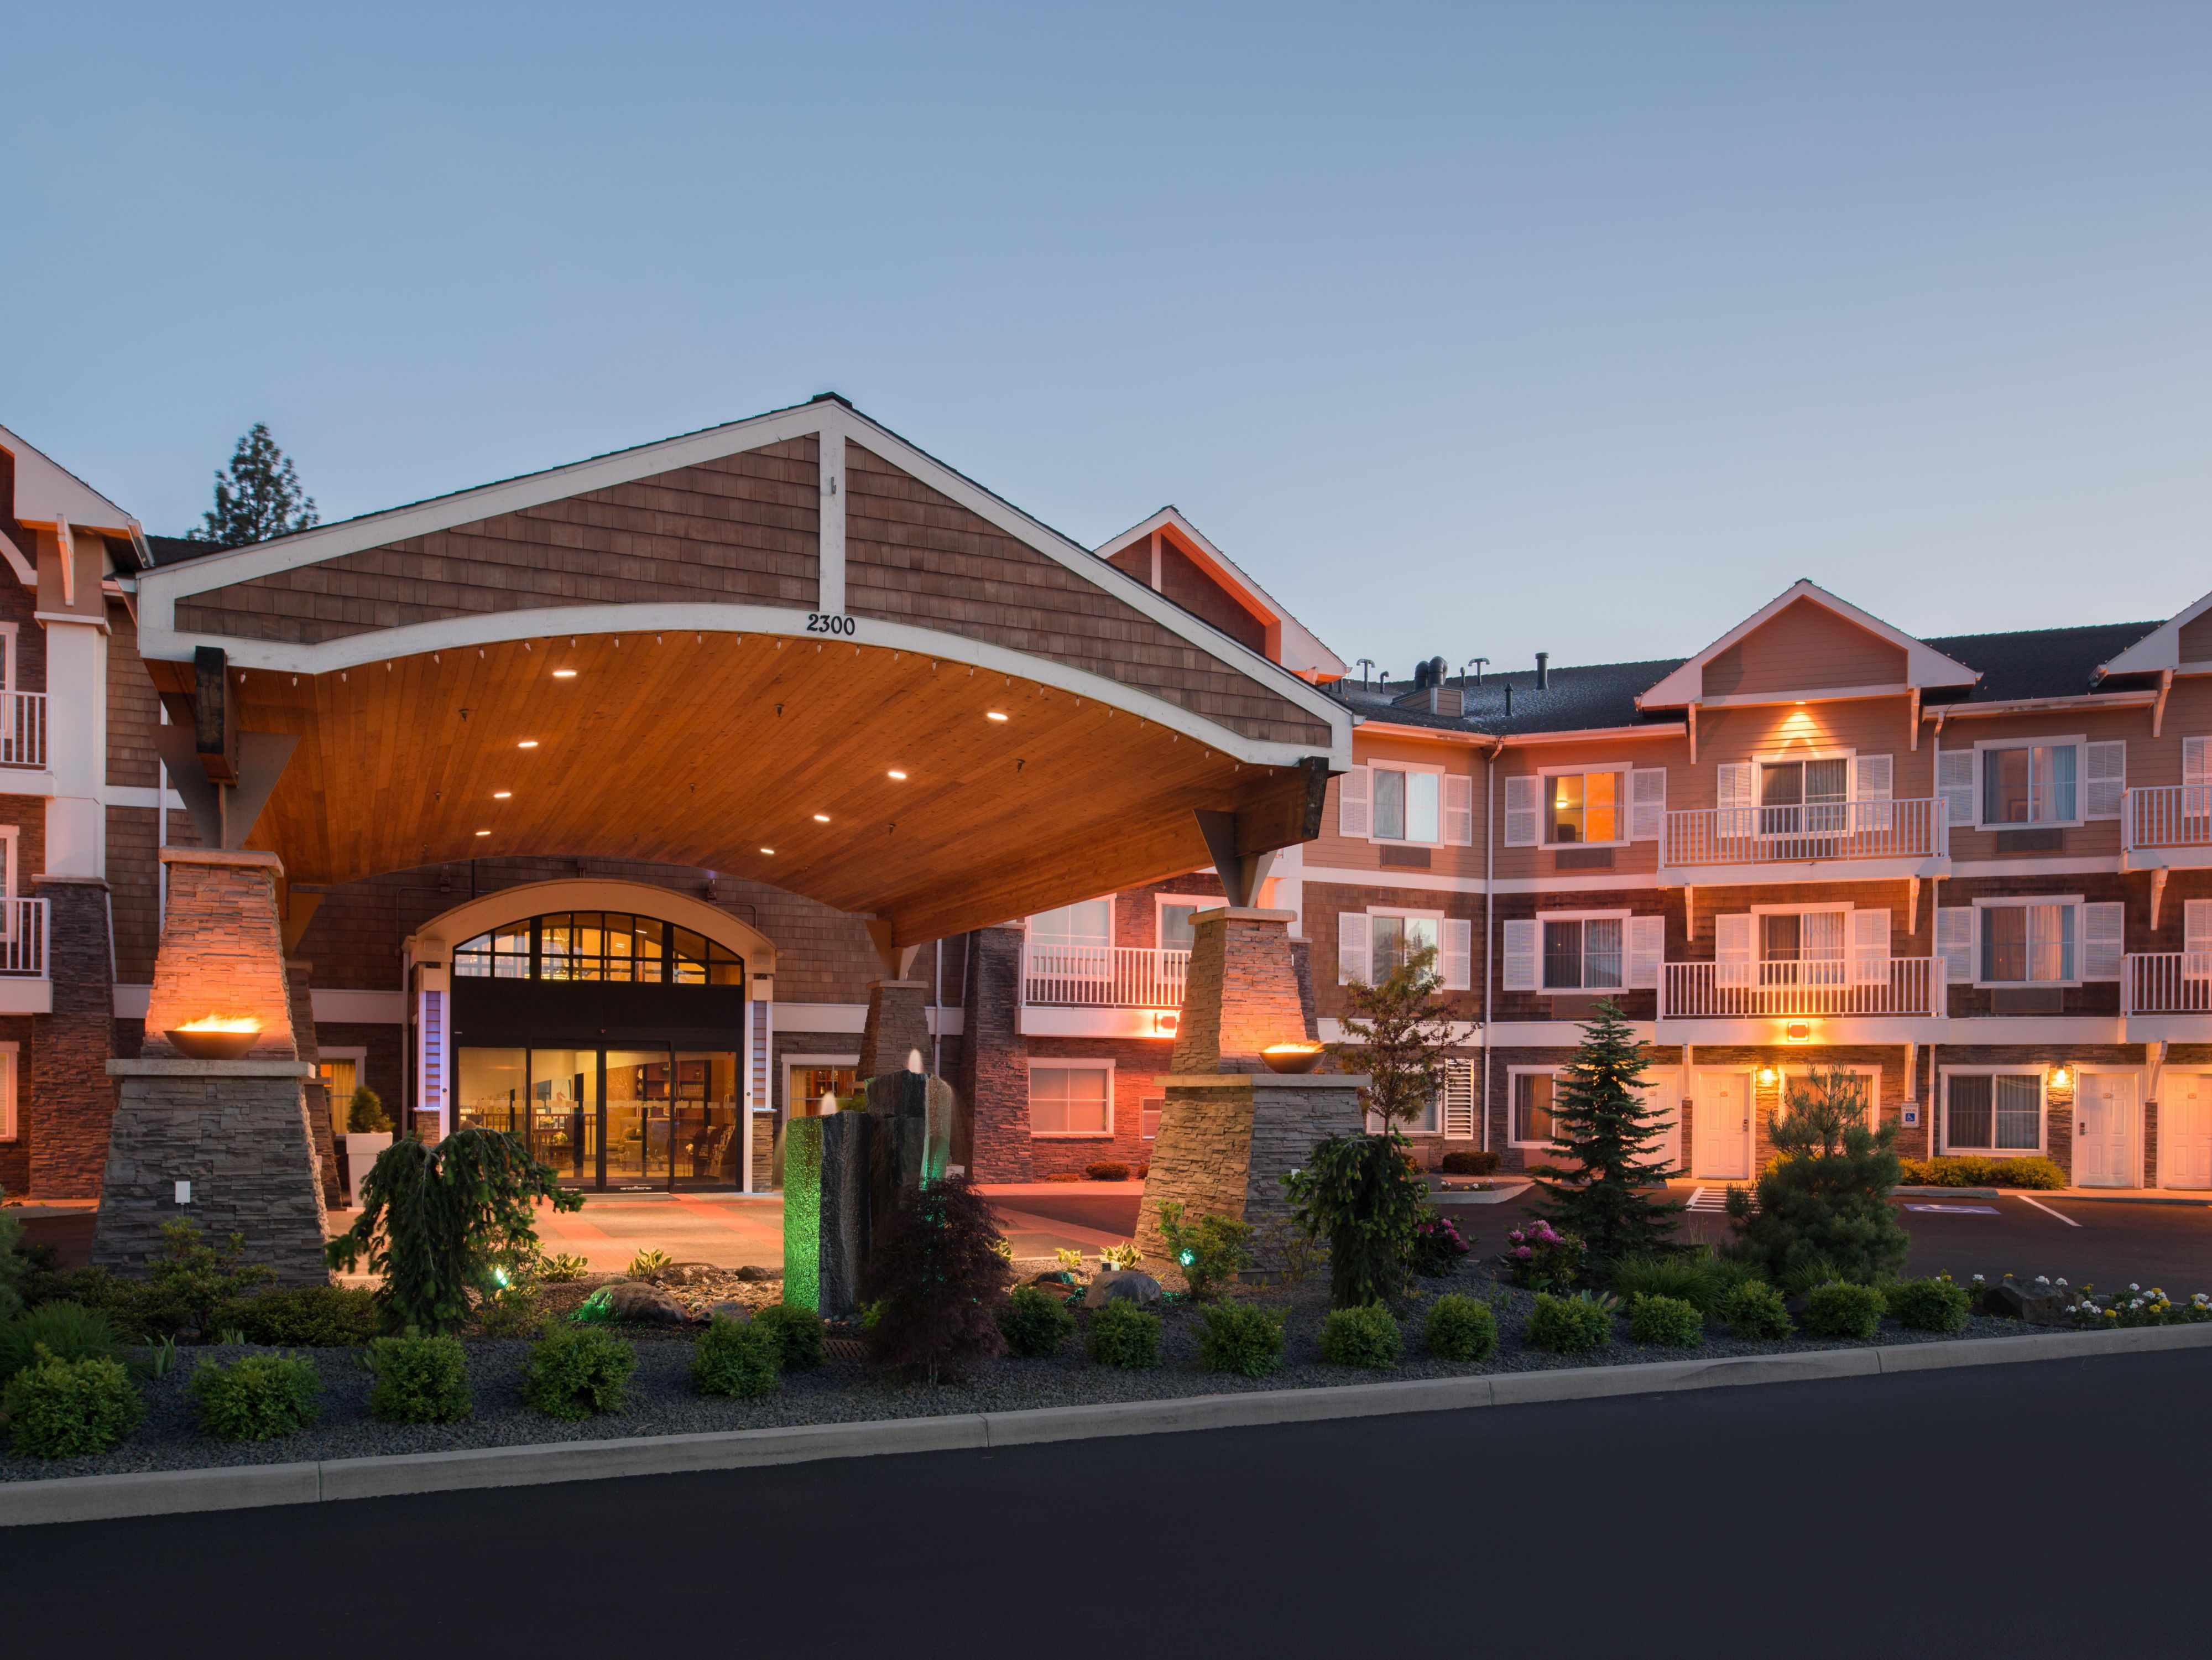 holiday inn express suites coeur d alene i 90 exit 11 hotel by ihg rh ihg com hotels in coeur d'alene idaho with pools hotels in coeur d'alene idaho with pools